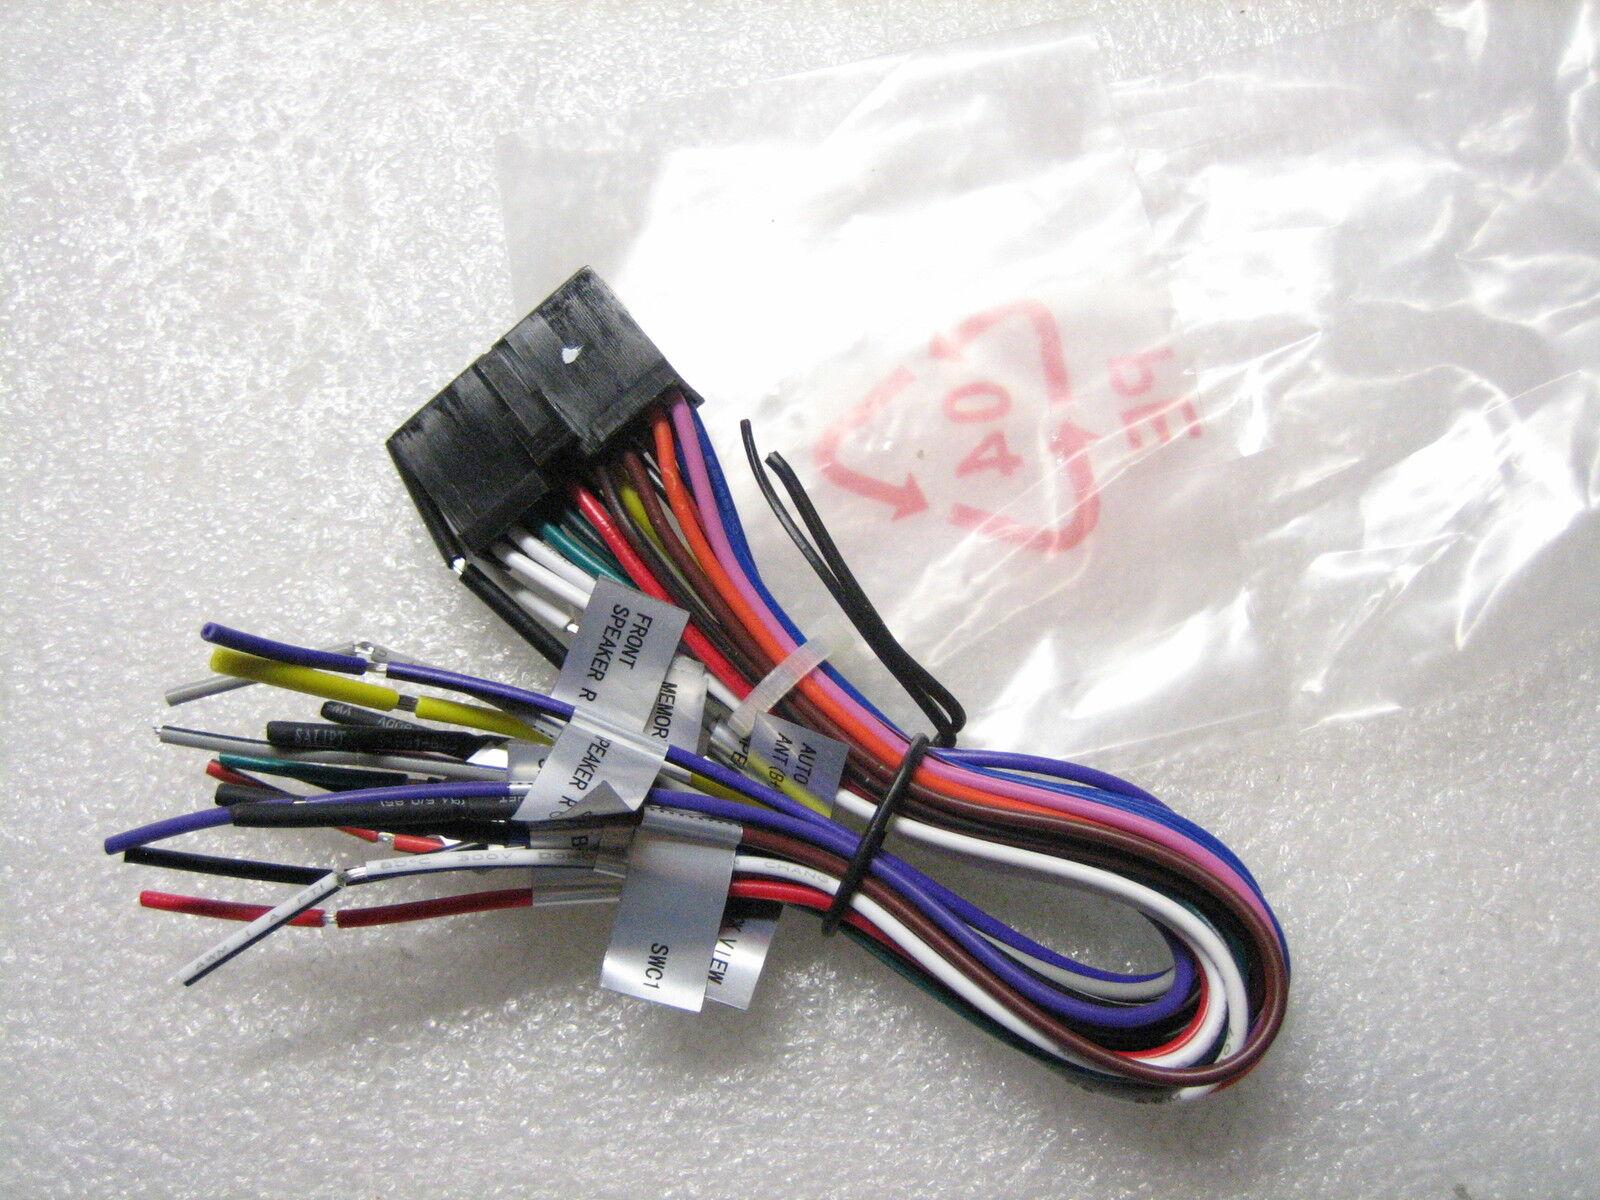 dual xdvd110bt wiring harness 29 wiring diagram images wiring diagrams creativeand co dual xdvd210bt wire harness dual stereo wire harness 12-pin radio power plug